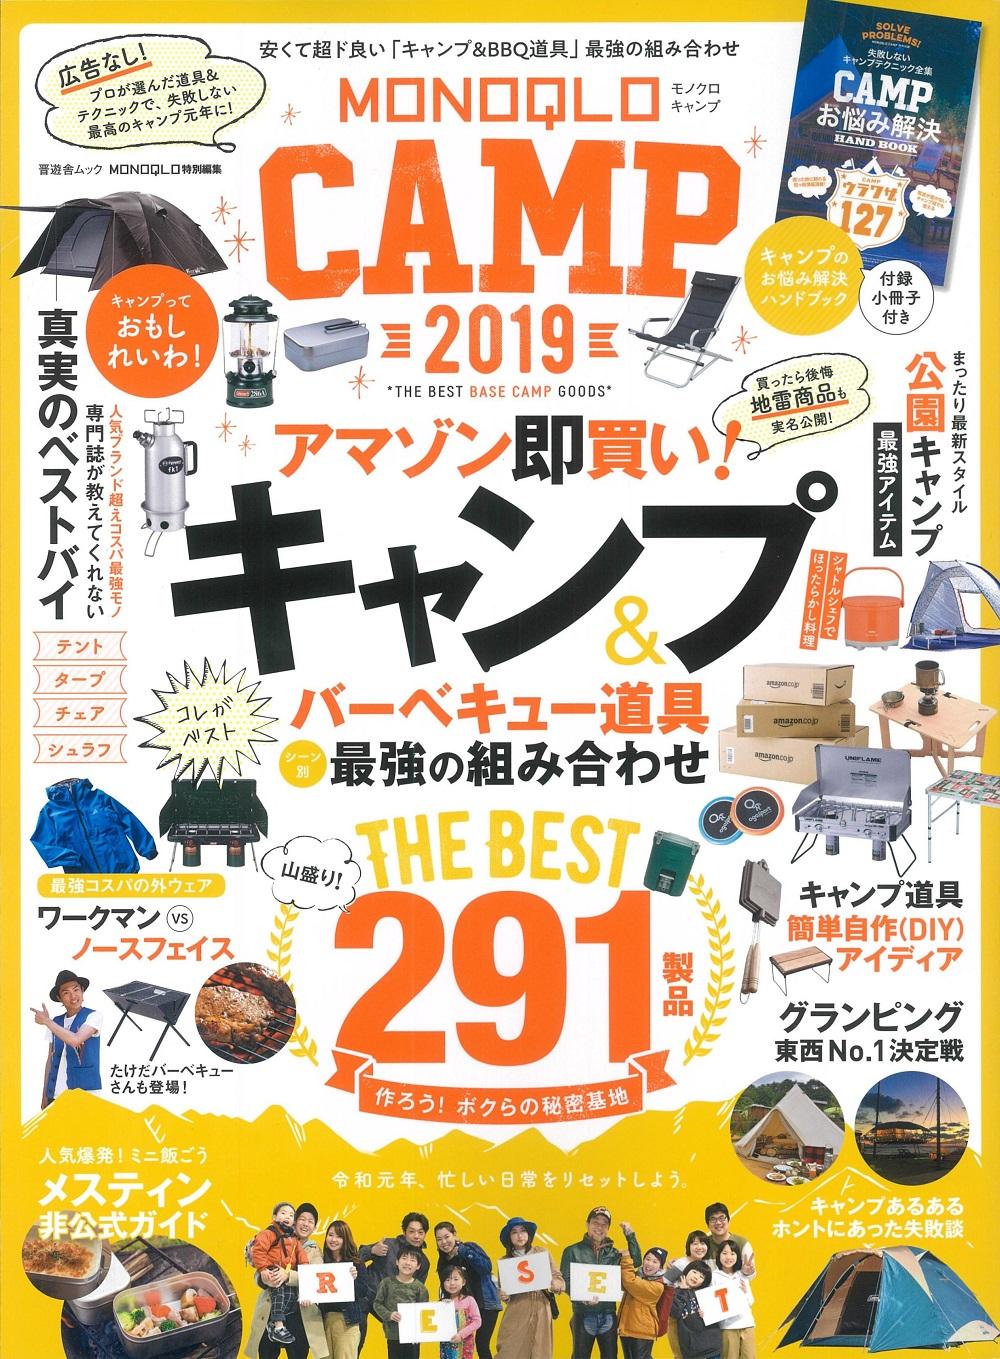 20190427 MONOQLO CAMP_COVER.jpg